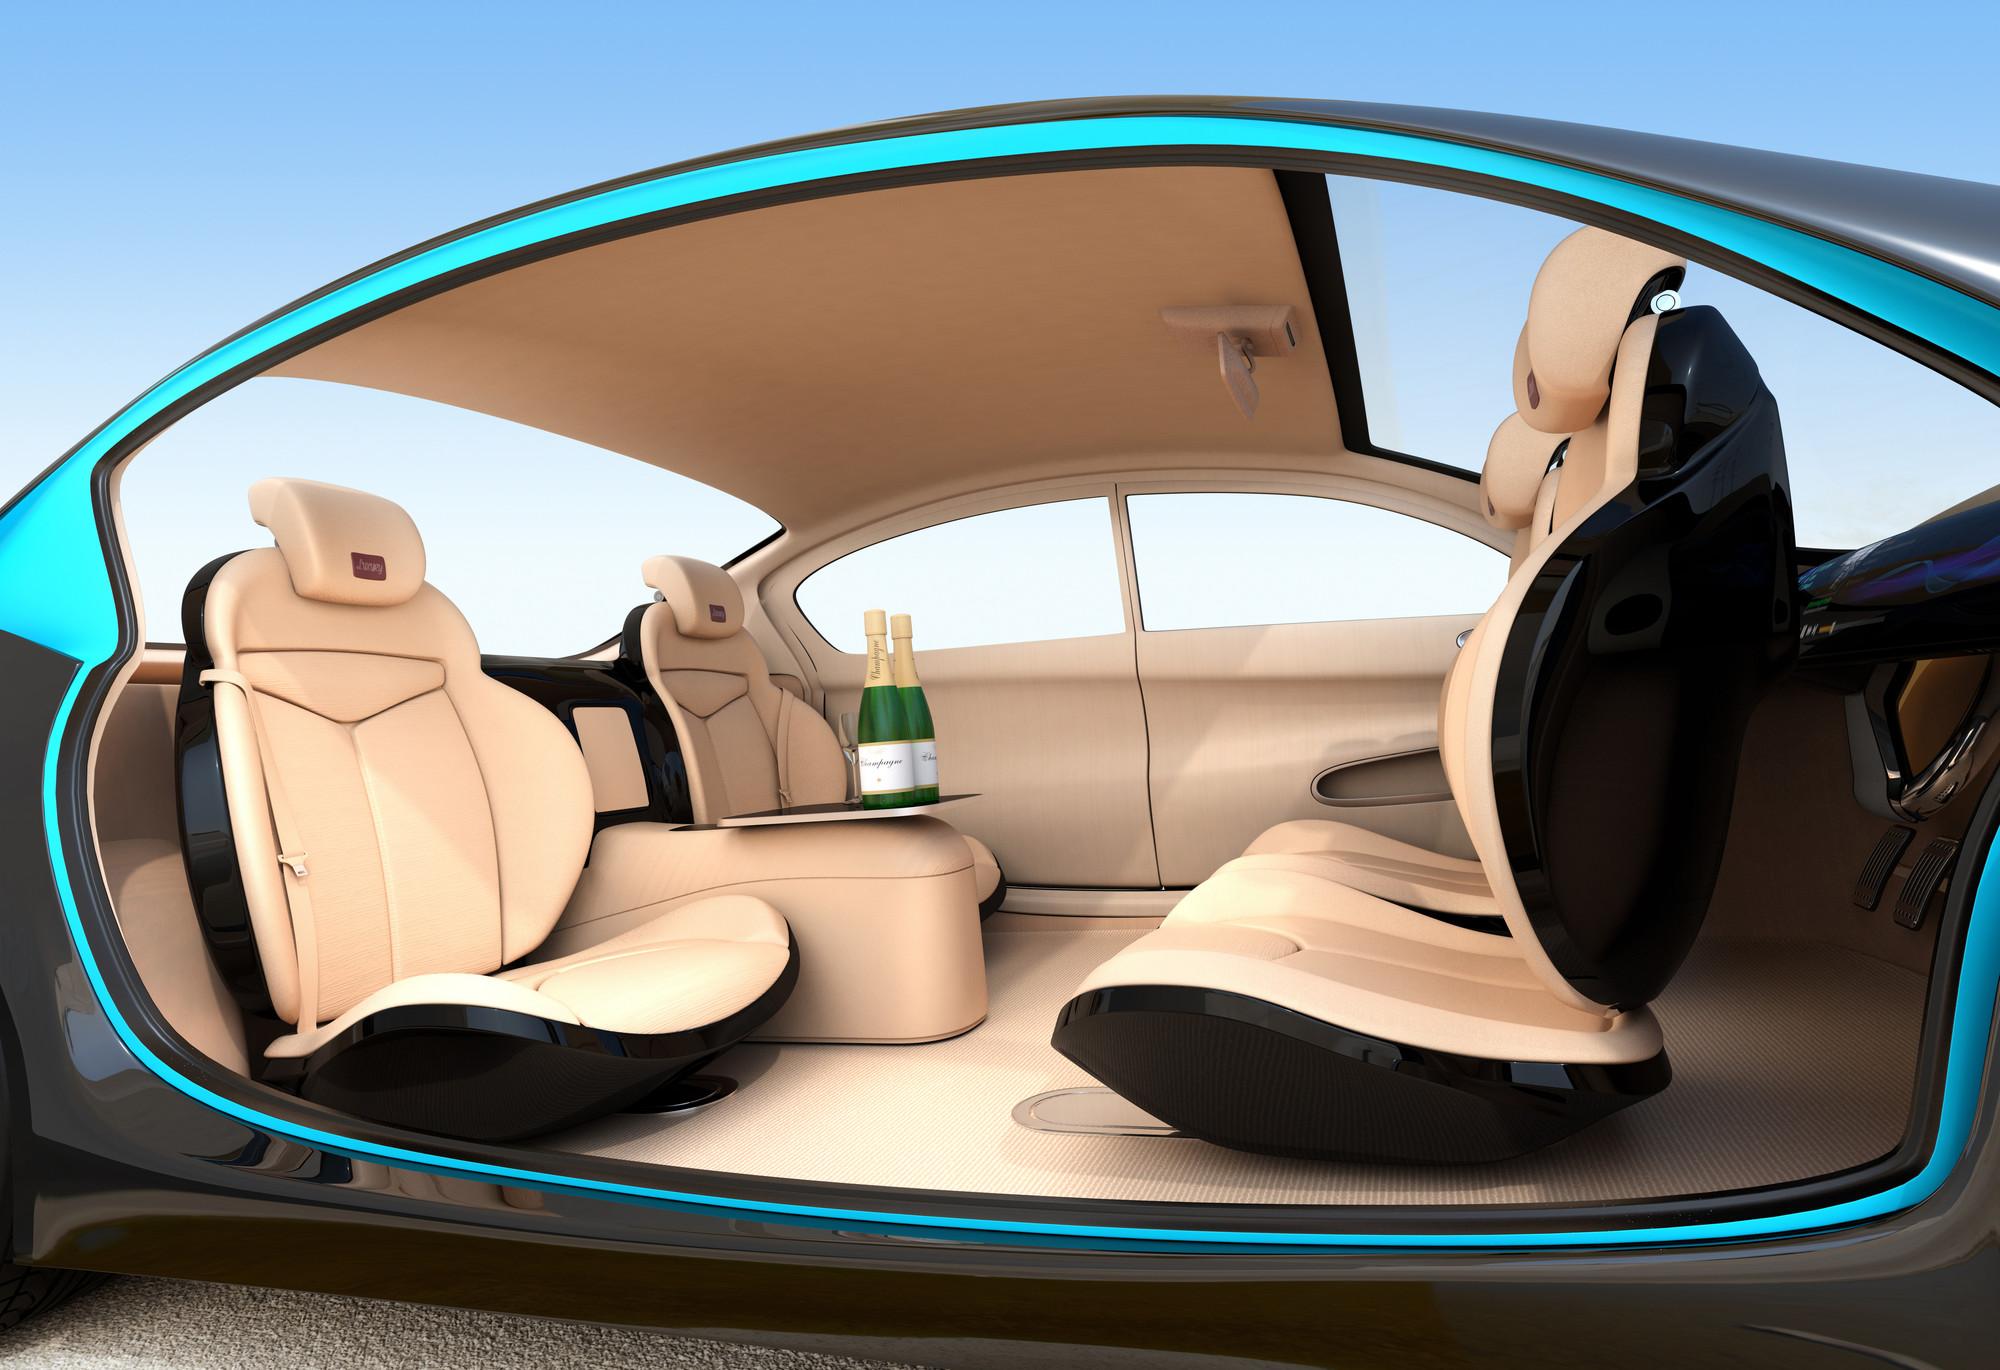 Self-drive car